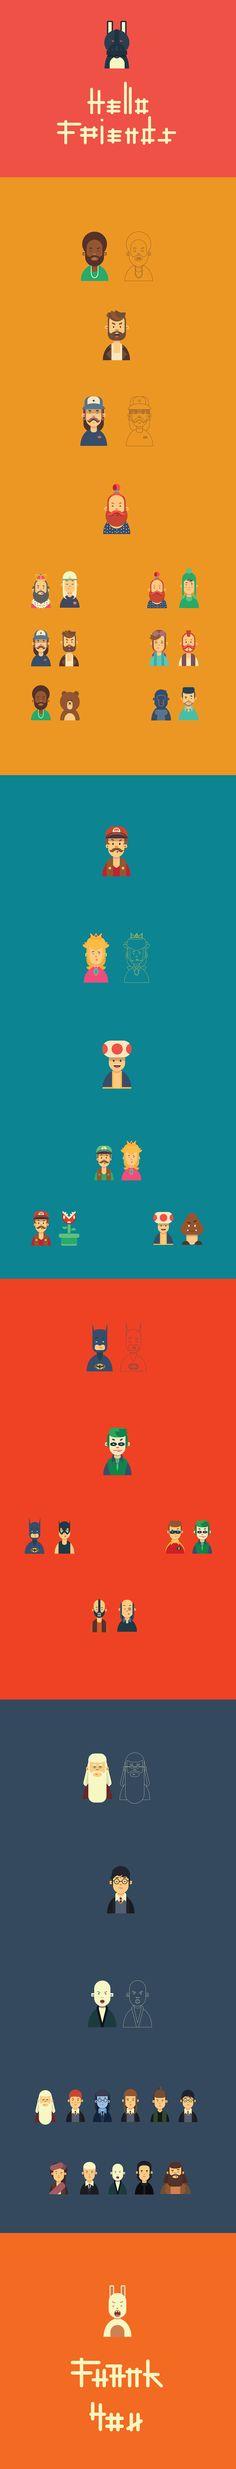 "Ознакомьтесь с моим проектом @Behance: «""Hello friends"" character flat design» https://www.behance.net/gallery/52188049/Hello-friends-character-flat-design"